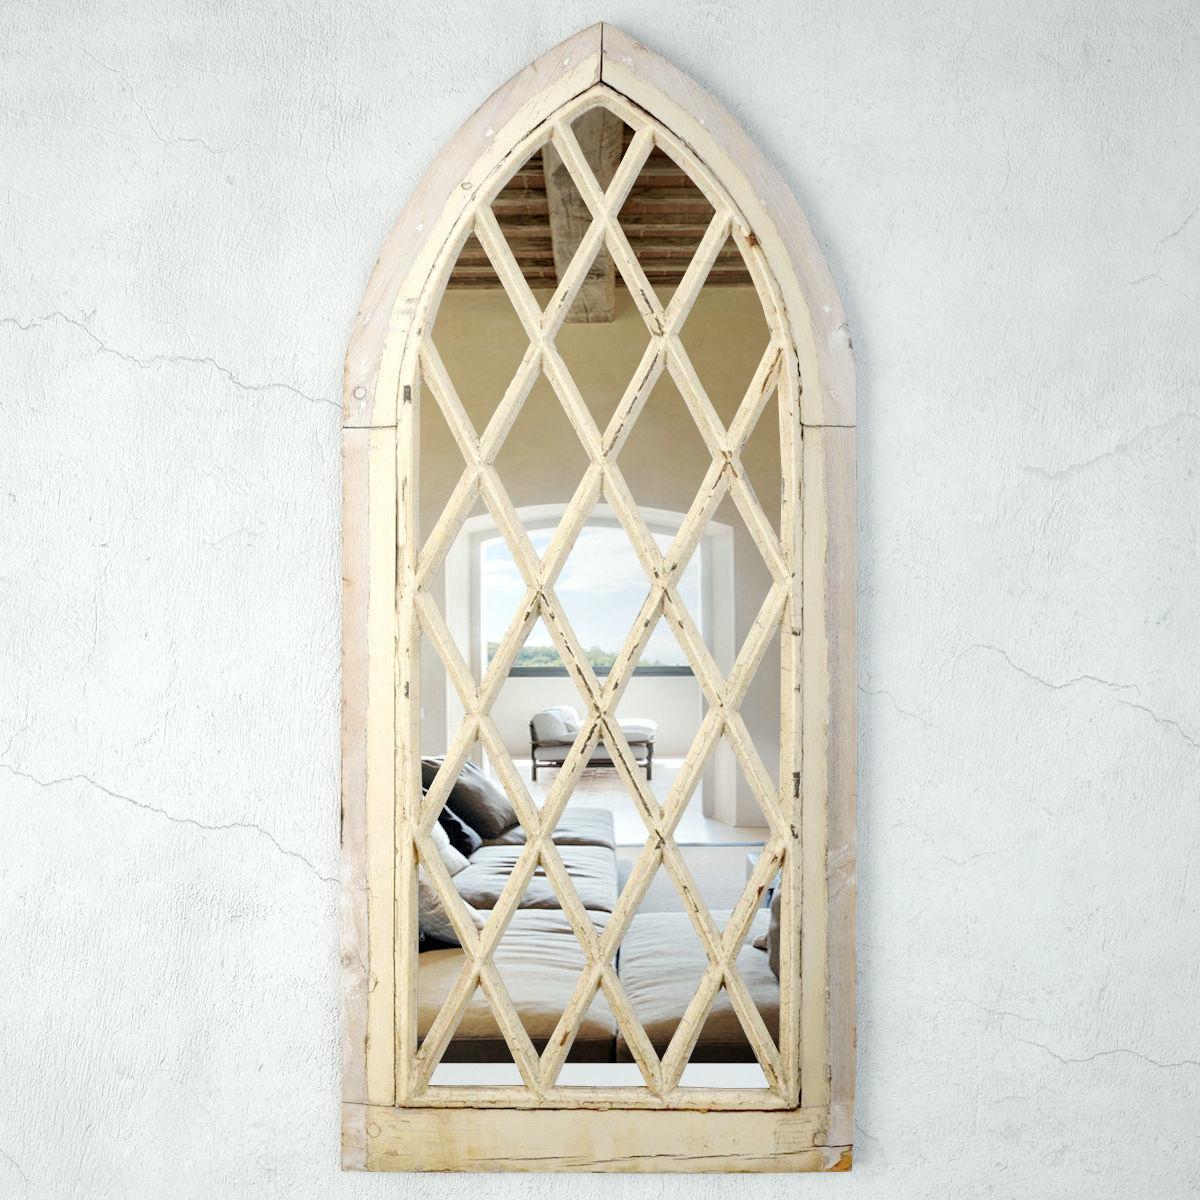 English Gothic Revival Church Window Mirror